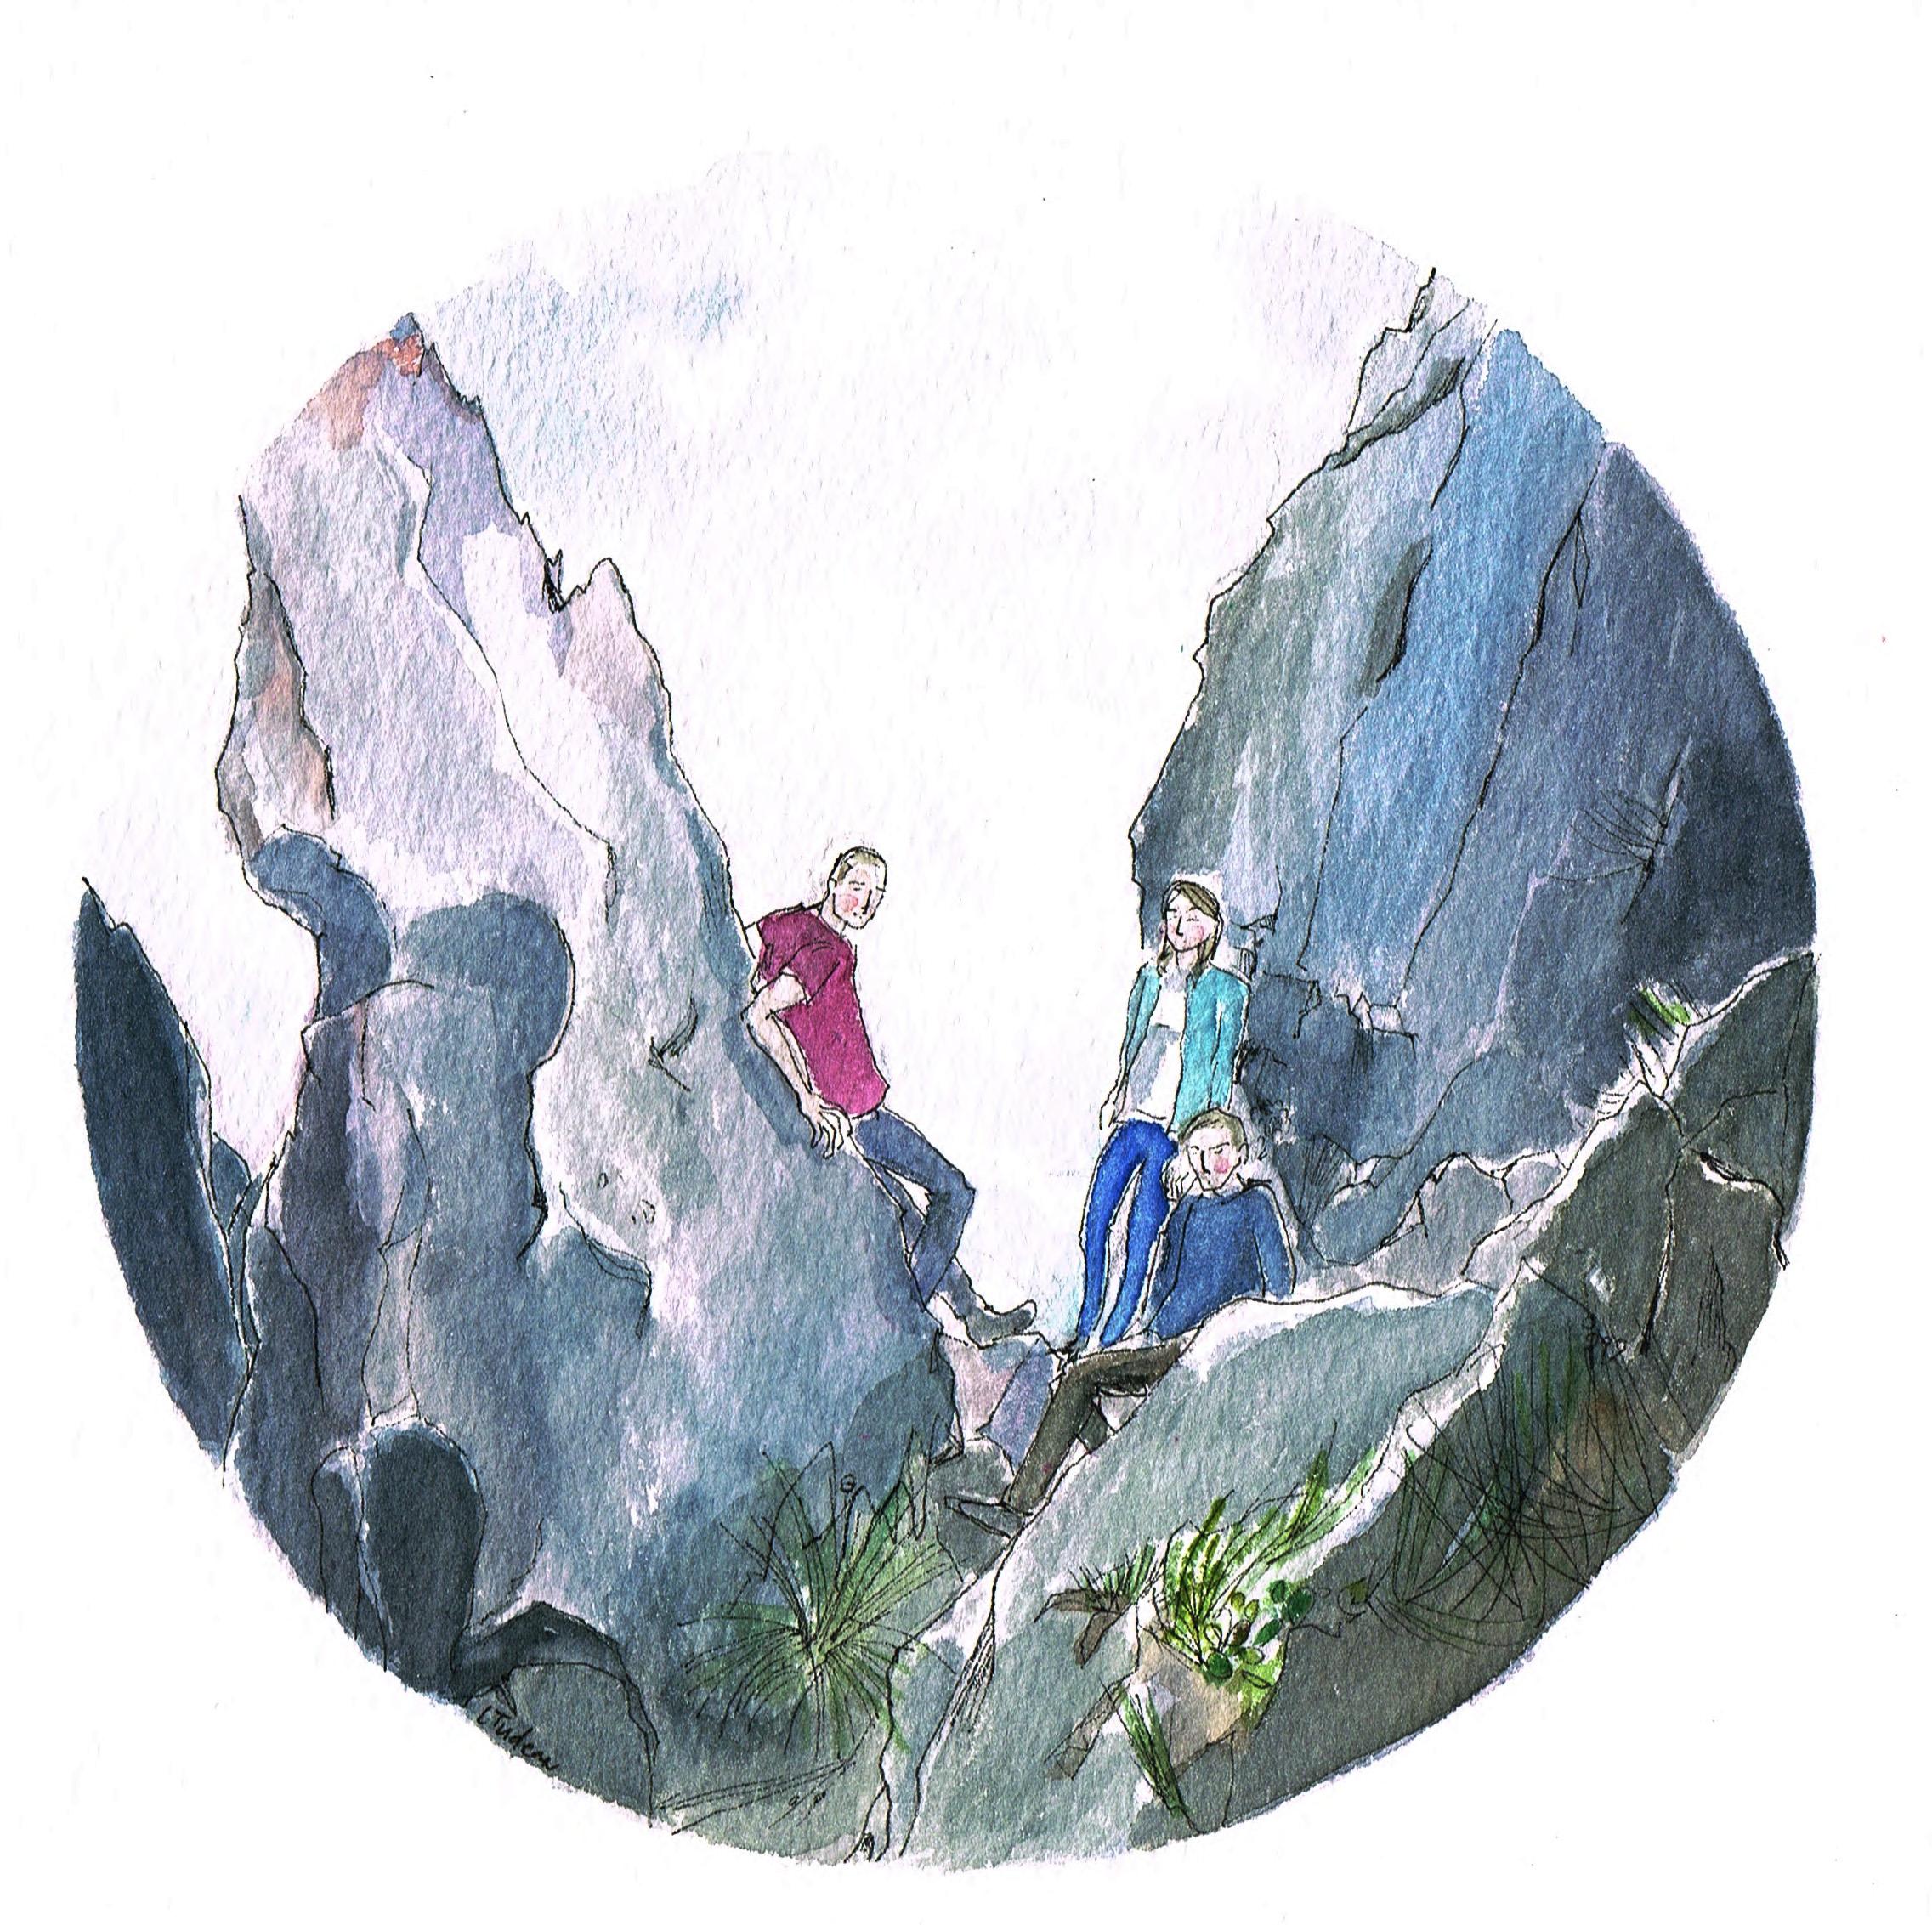 Hike in Oberland